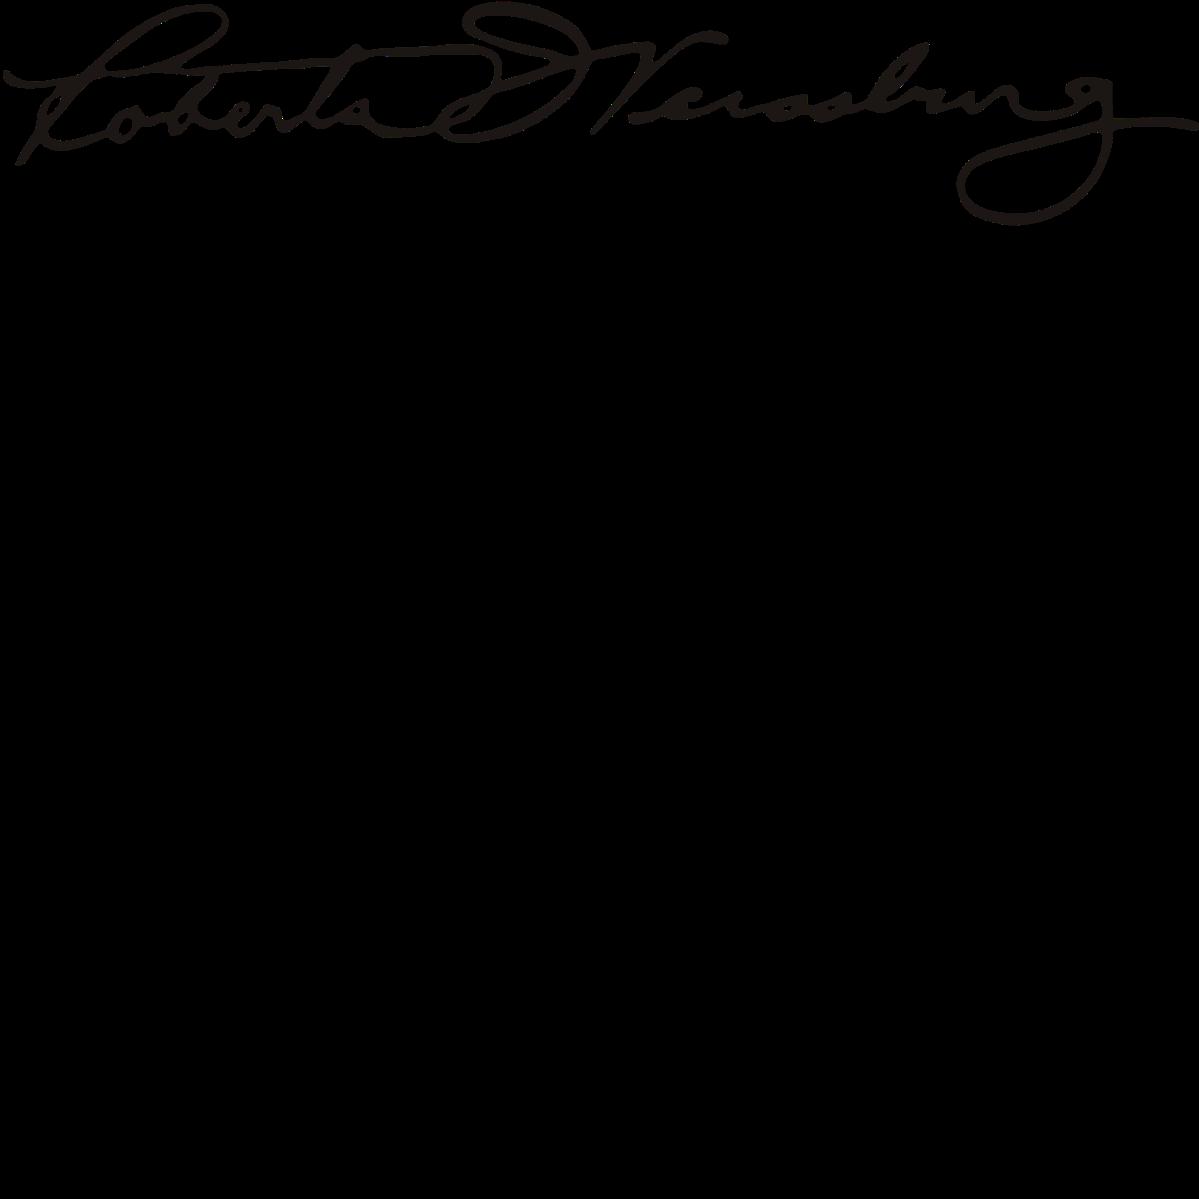 Roberta Weissburg Leathers